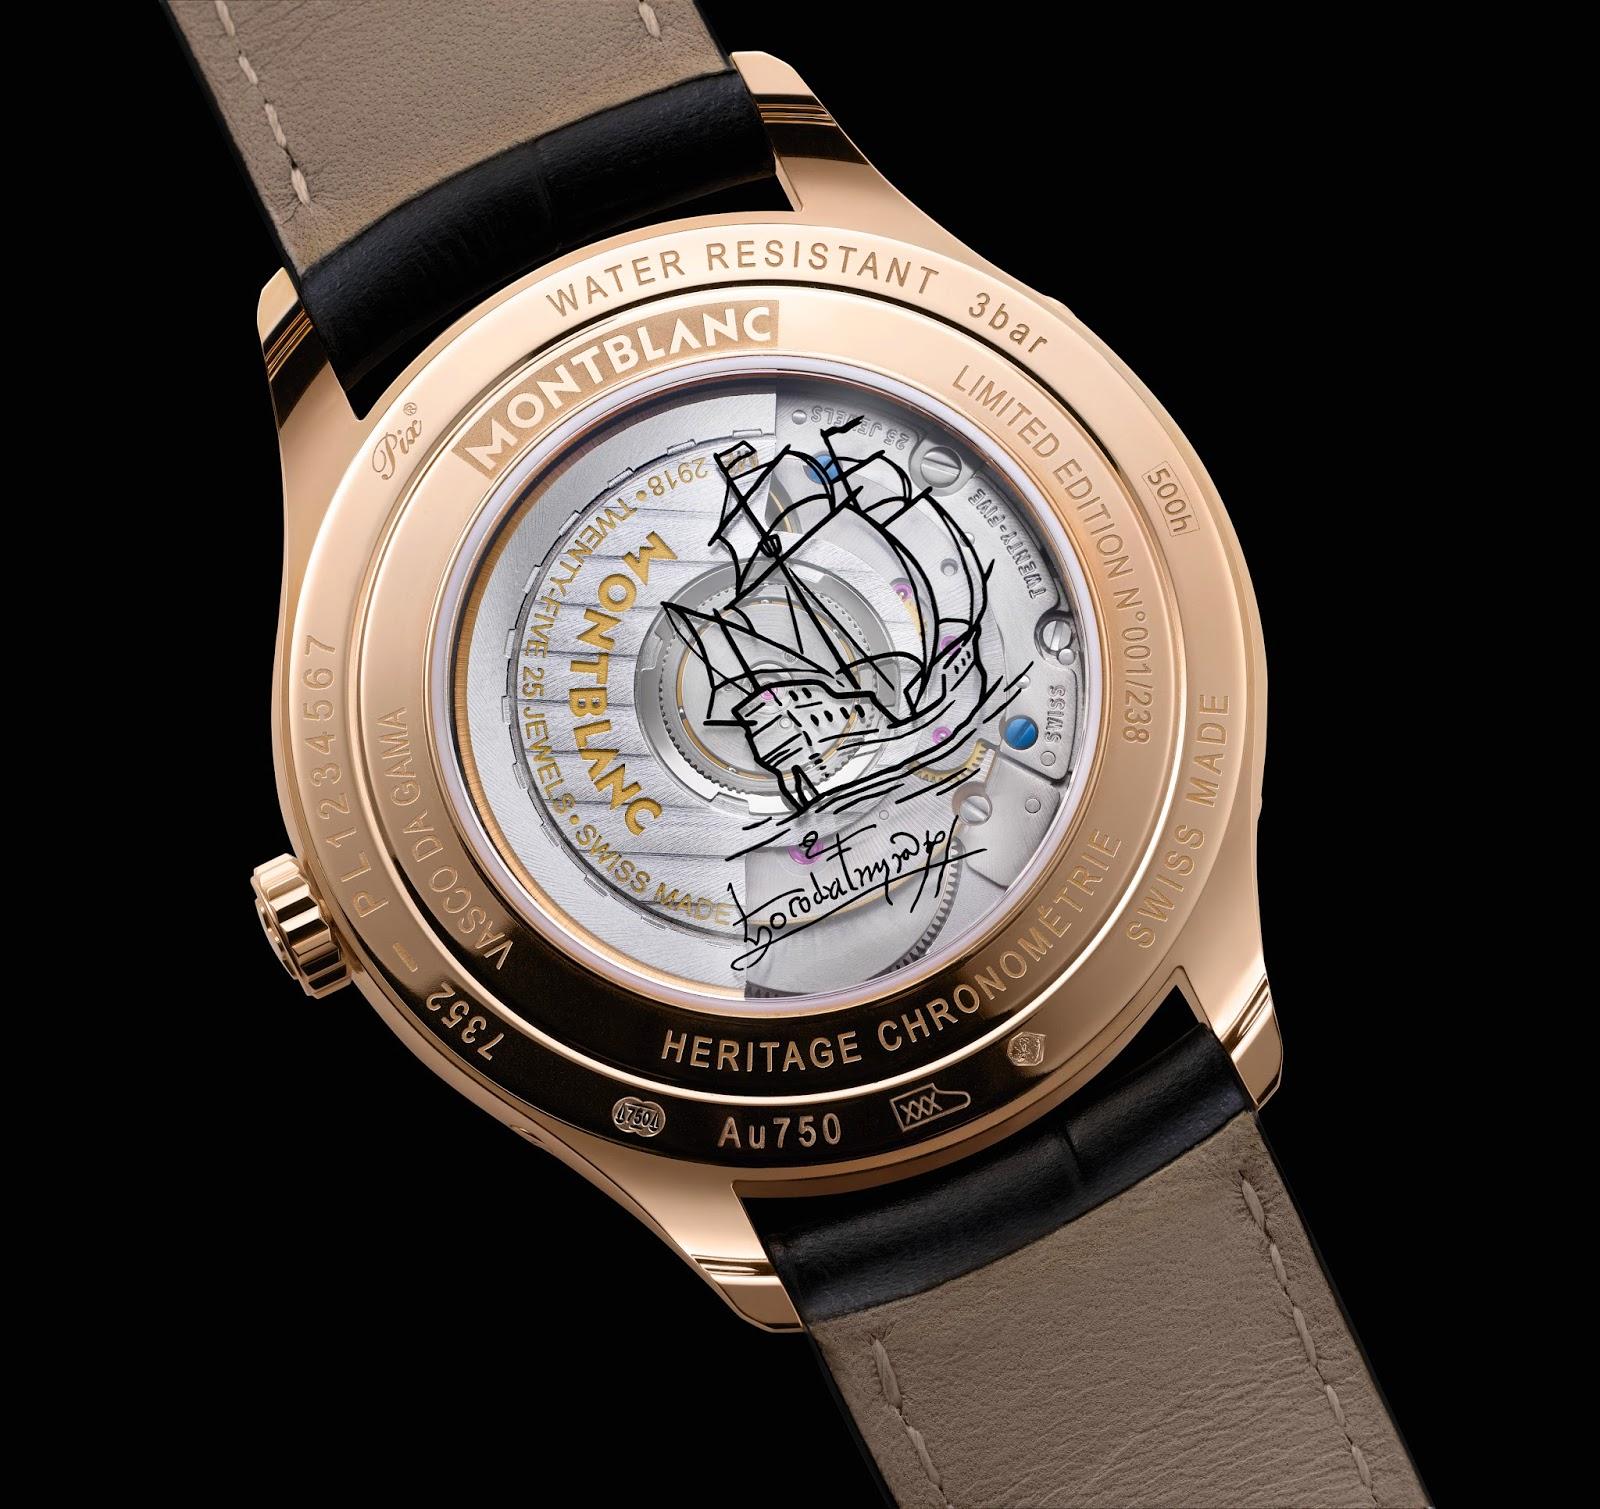 Montblanc Heritage Chronométrie debajodelreloj14